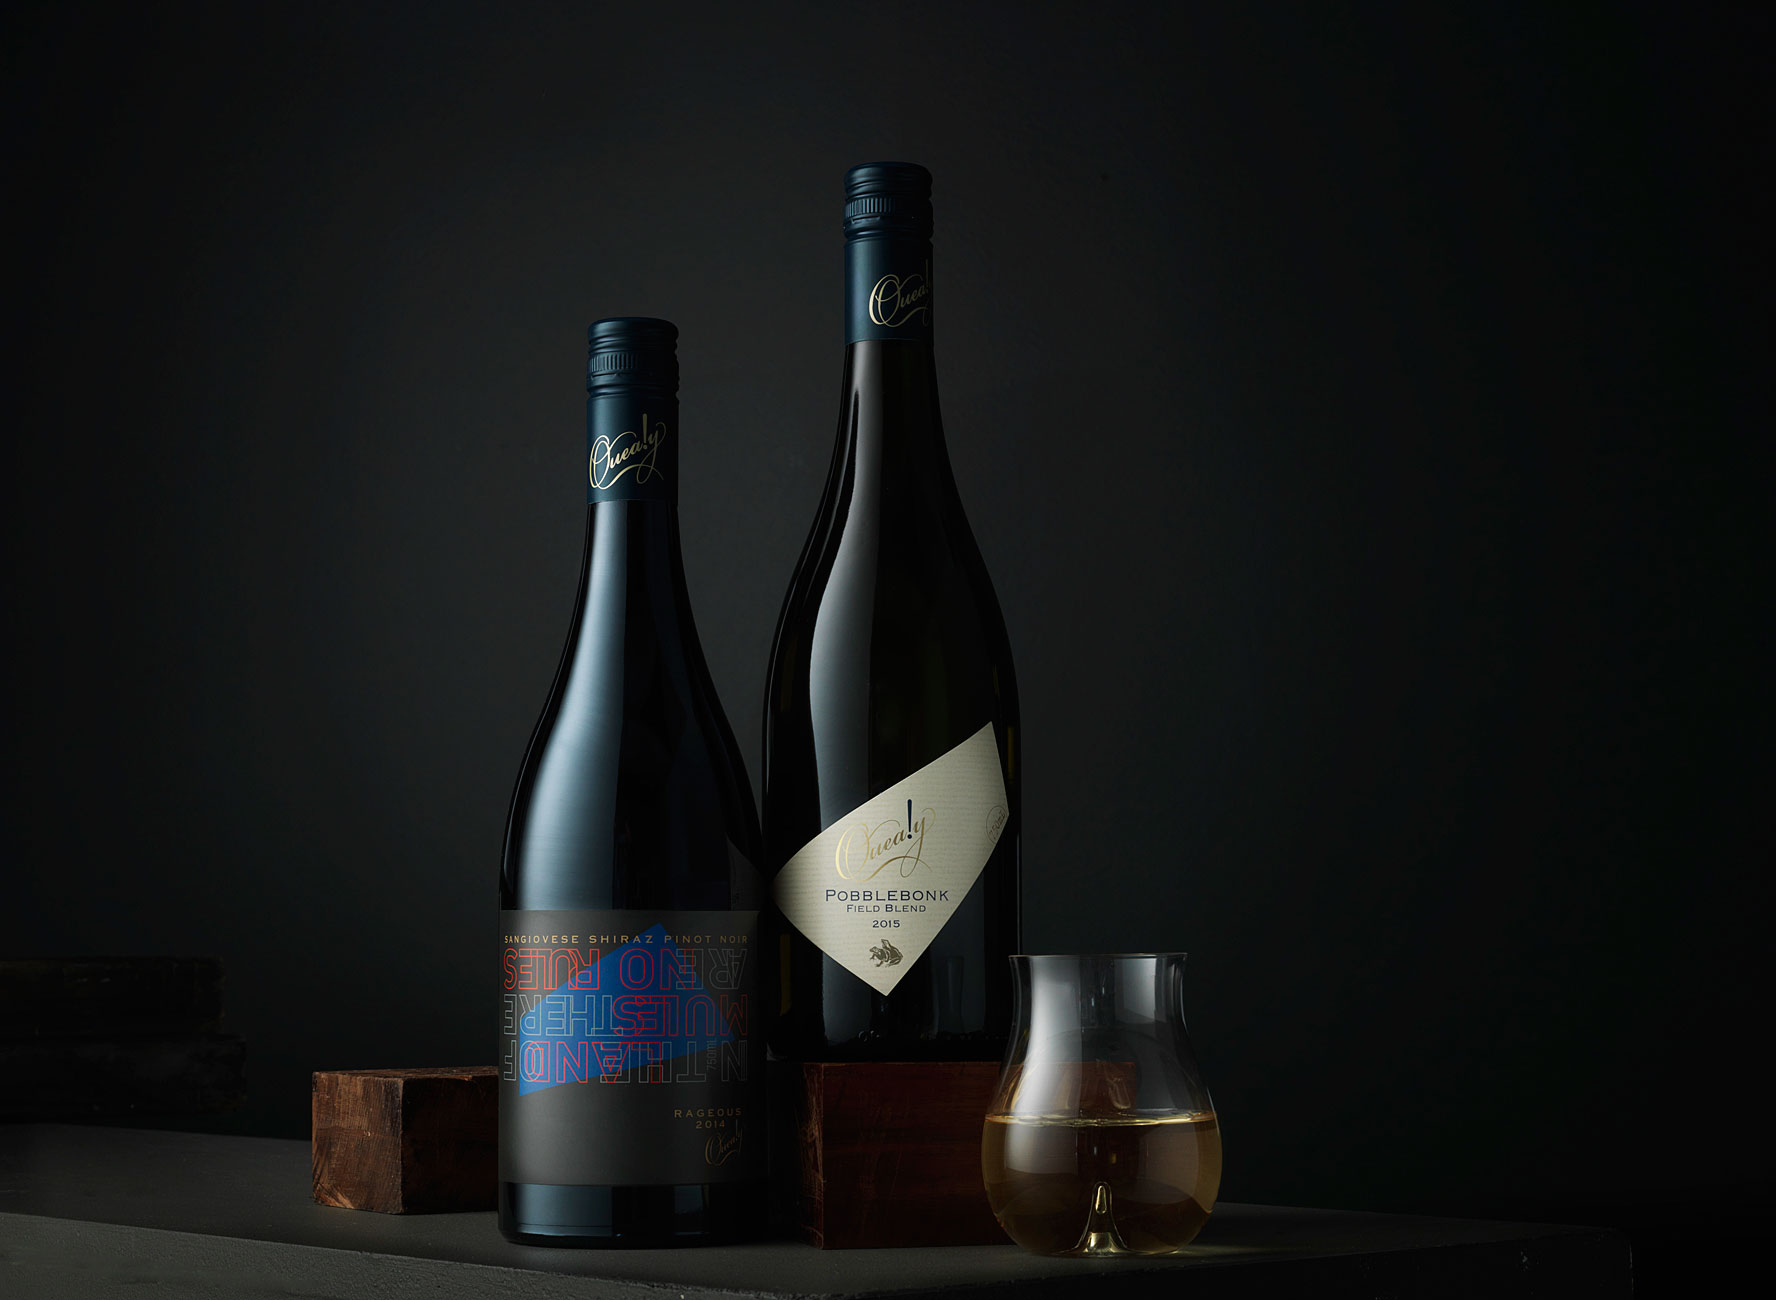 wine-bottle-photography-ijproductions3.jpg